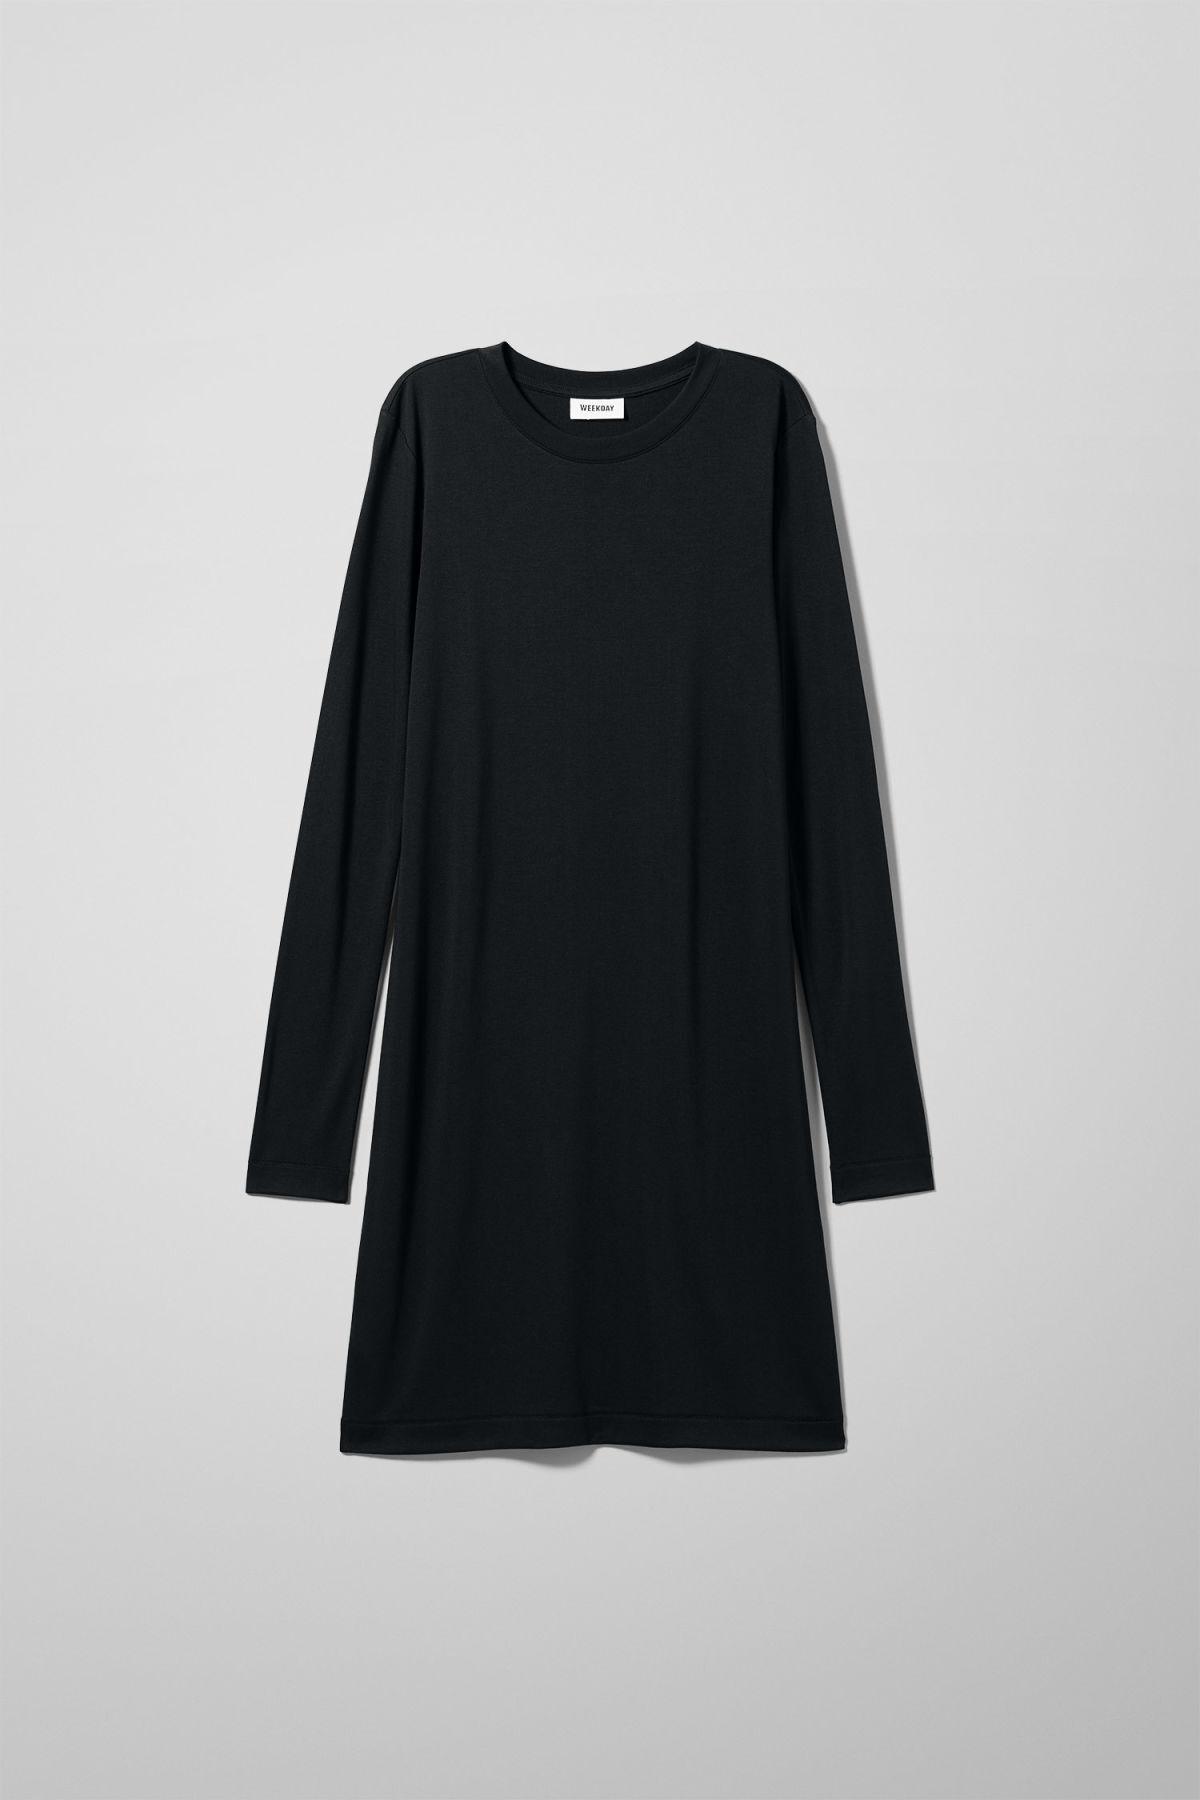 Image of Beyond Long Sleeve Dress - Black-XS